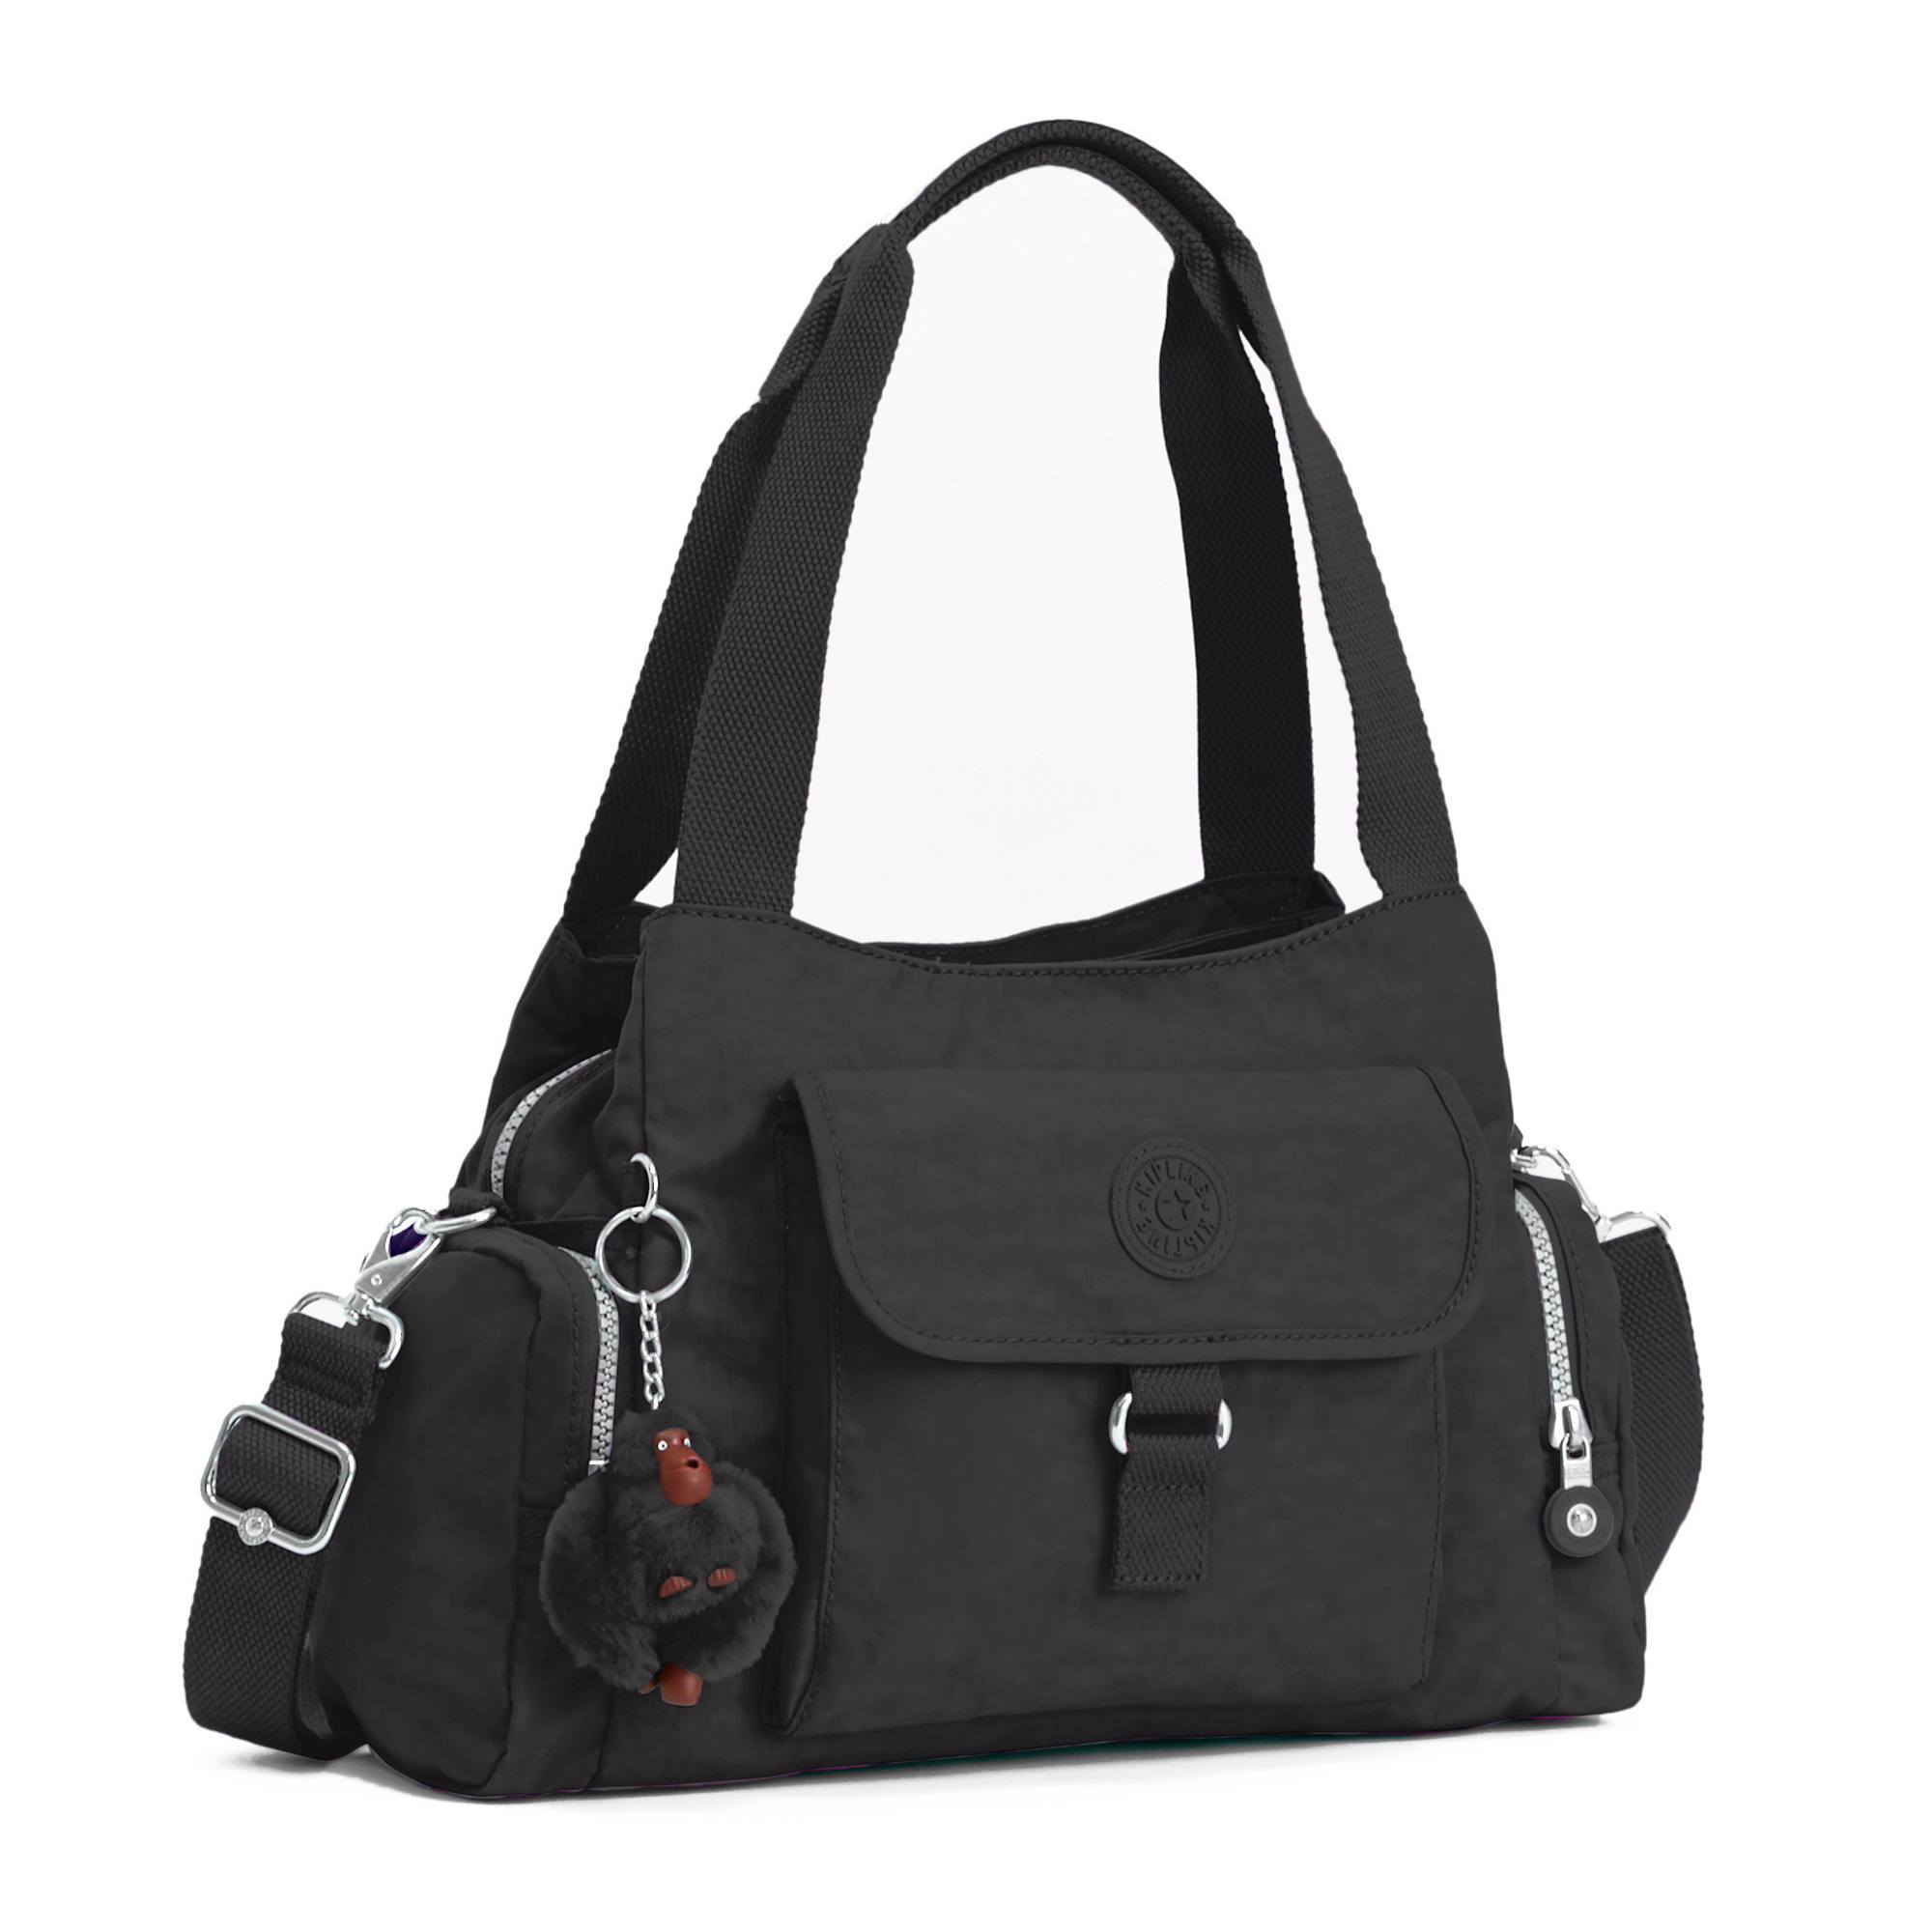 Kipling-Felix-Large-Handbag miniature 8